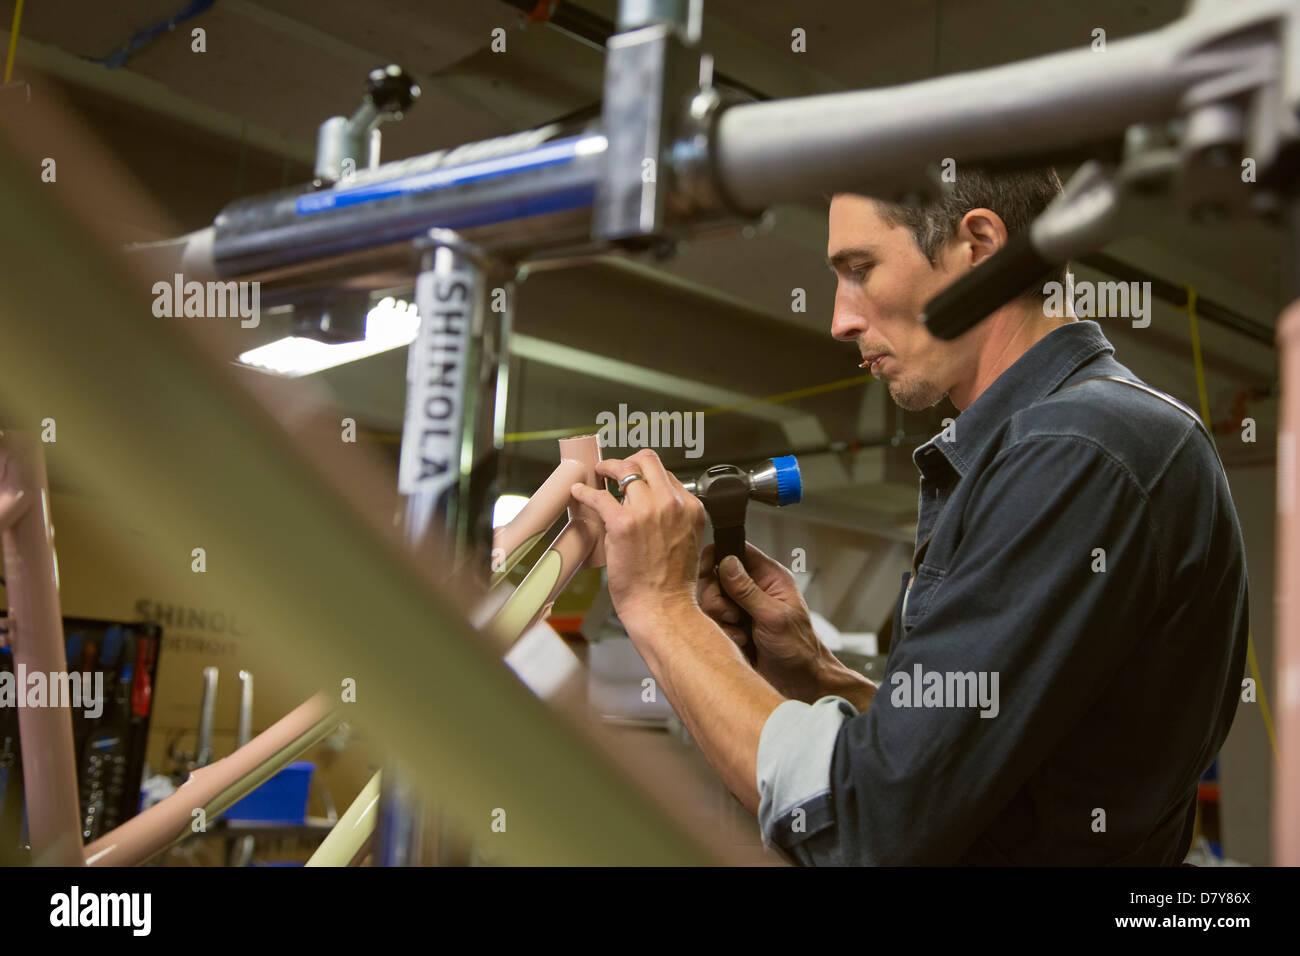 Fabricación de bicicletas en Detroit. Imagen De Stock